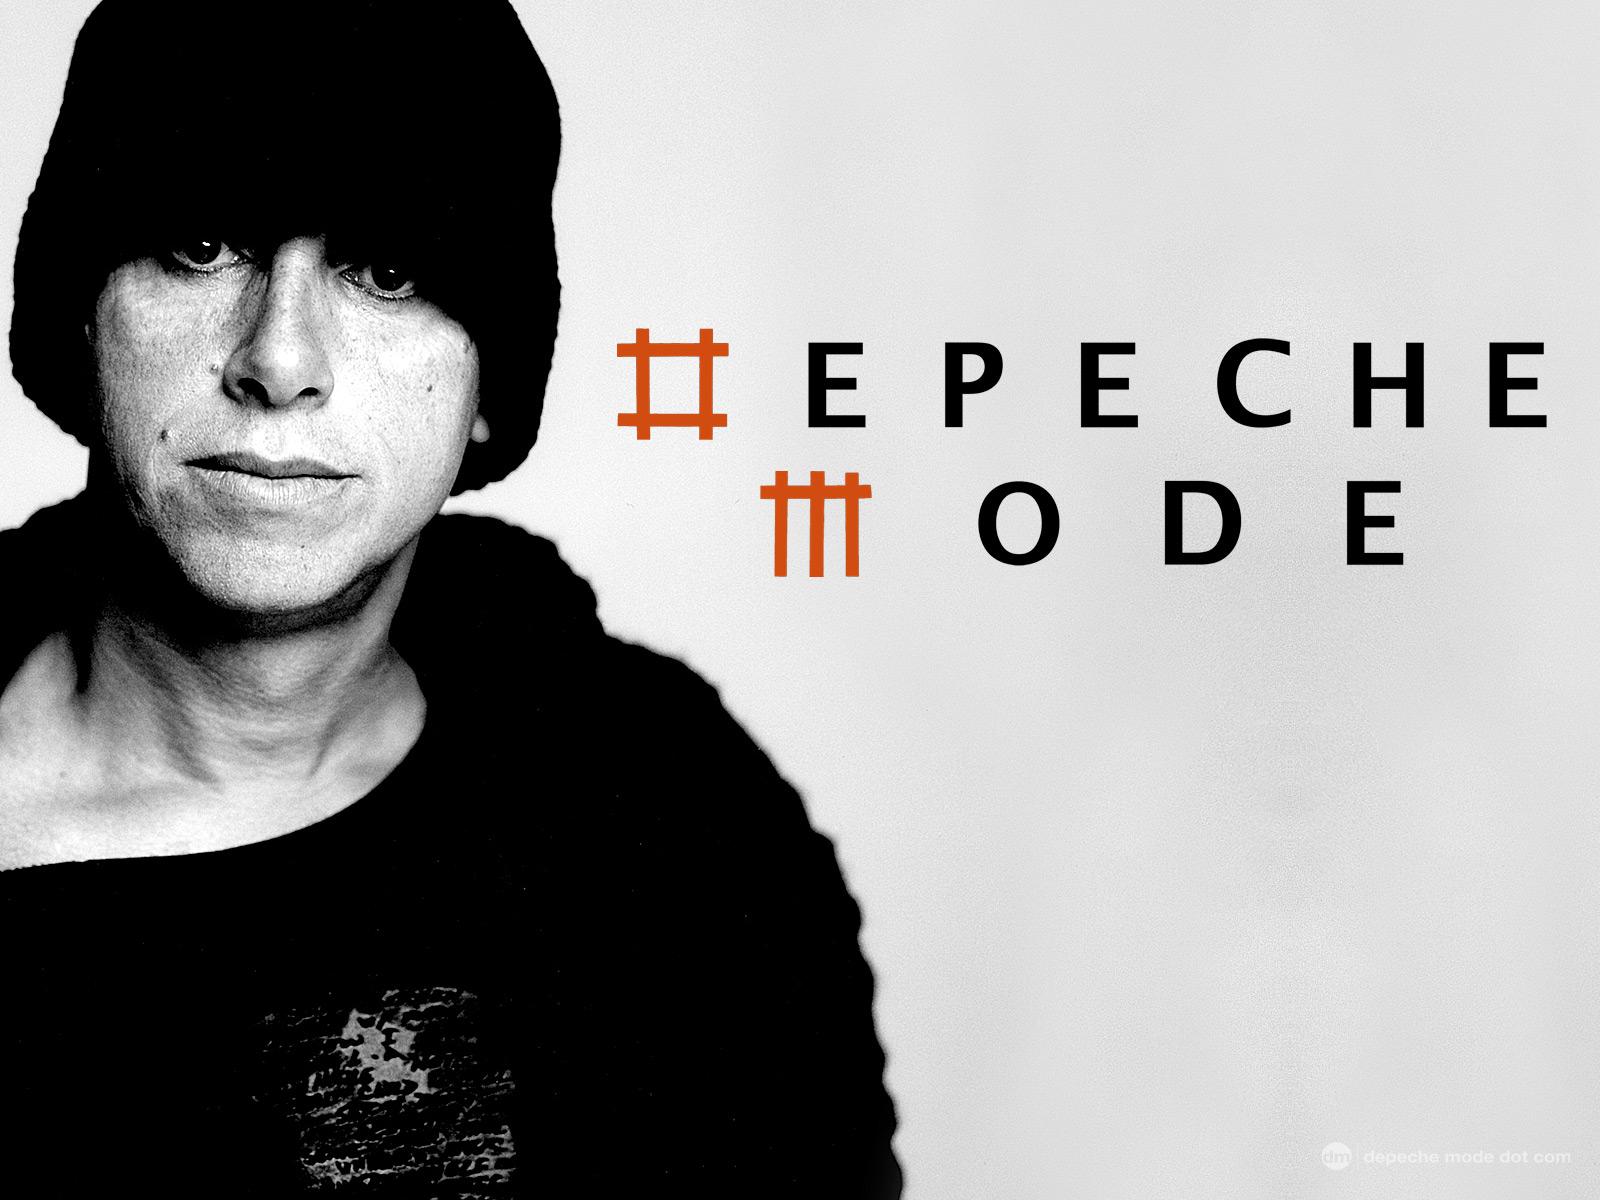 Depeche Mode Tour of The Universe 2009.